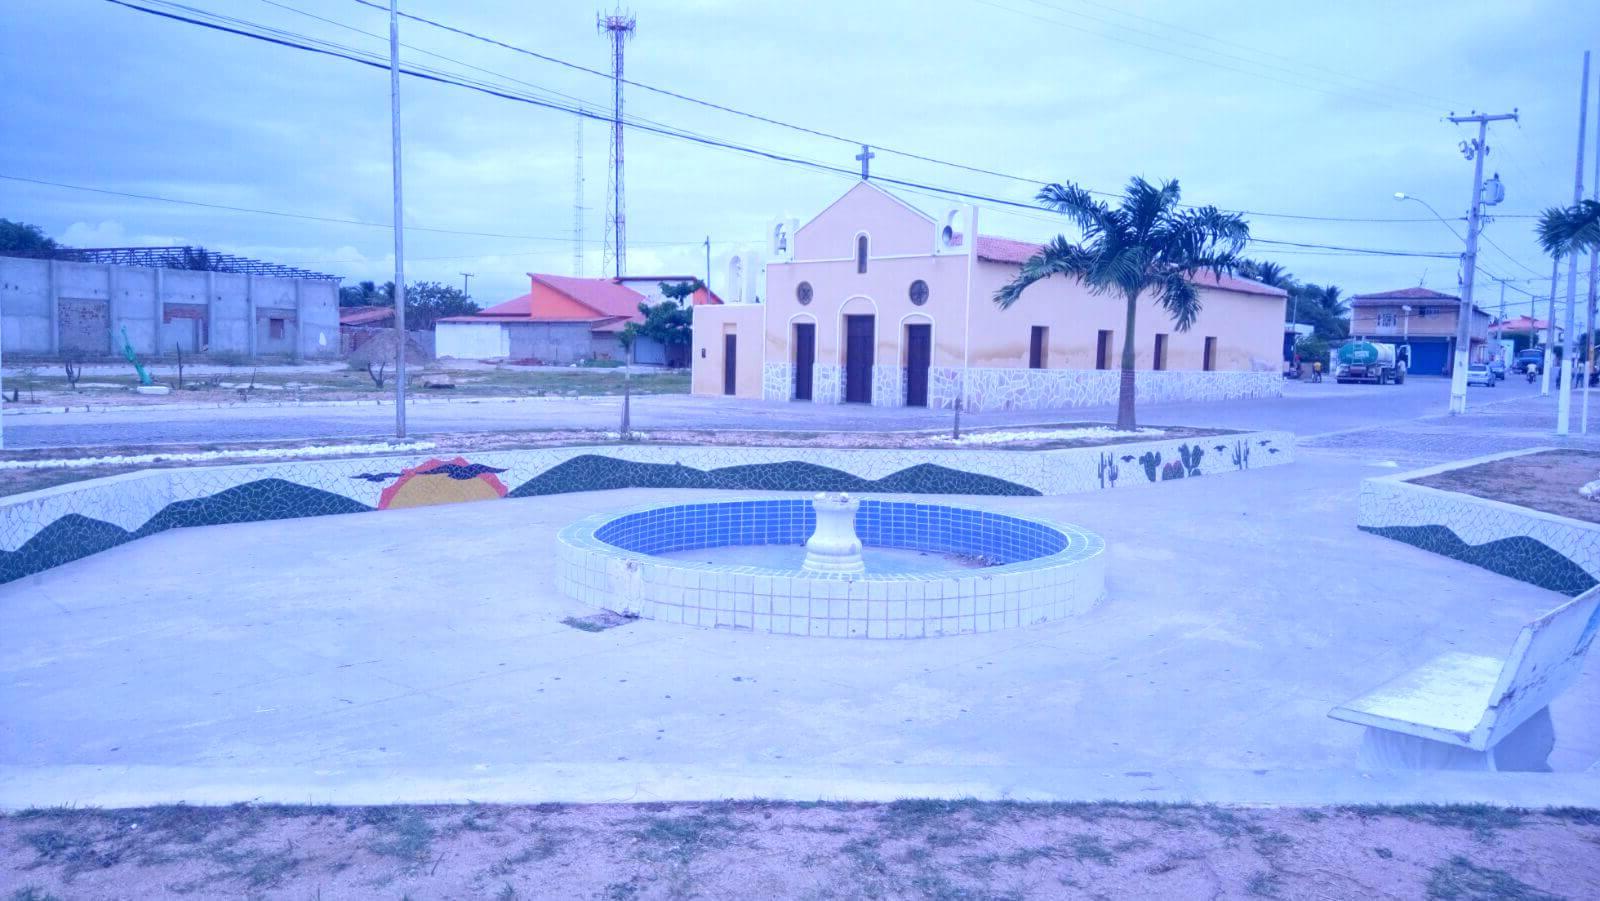 Mei Microempreendedor em São Vicente do Seridó, PB